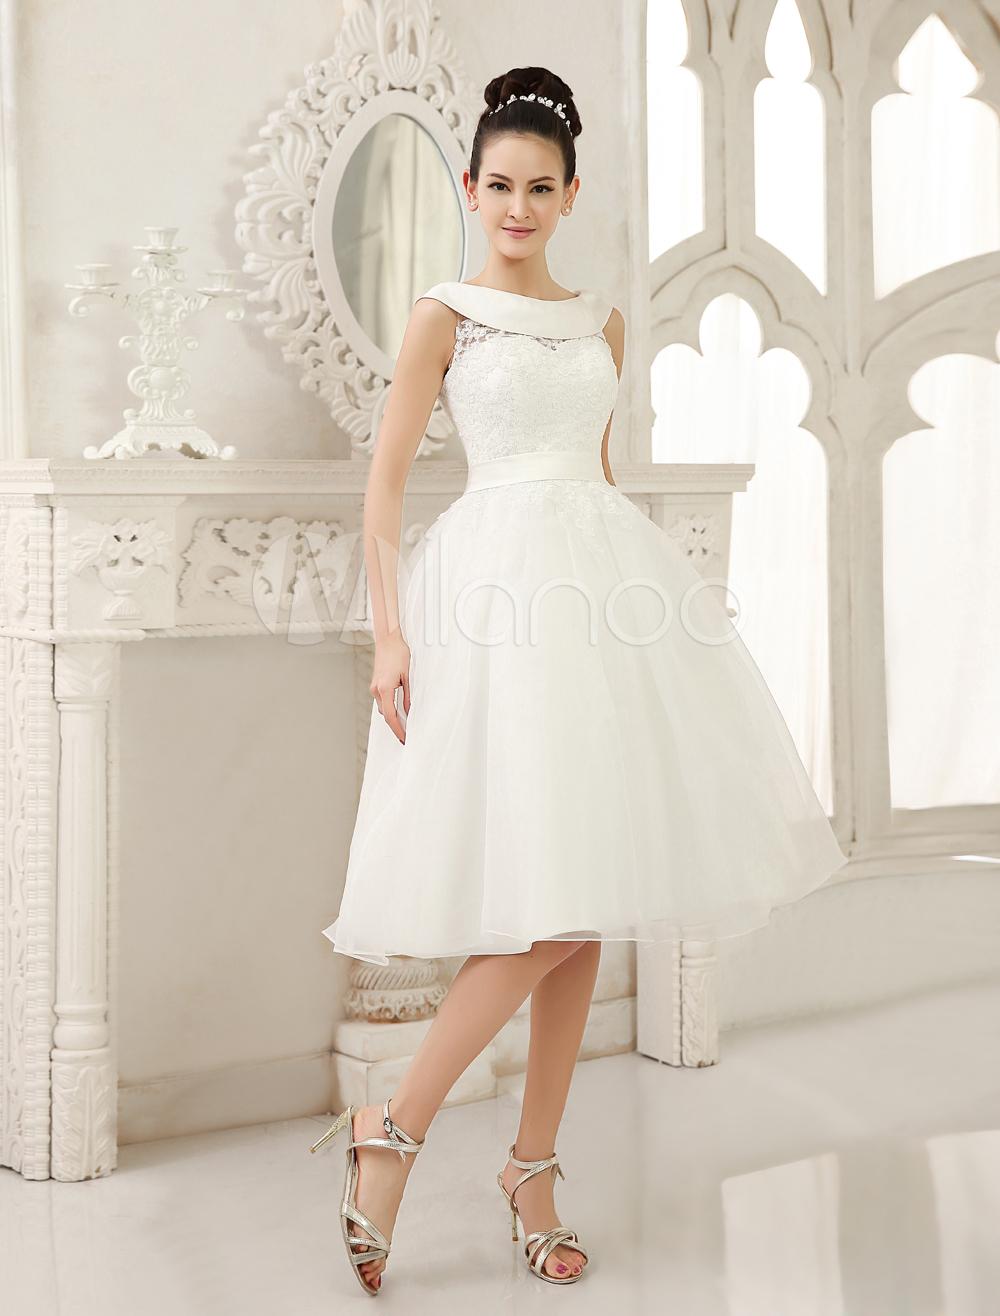 Ivory Knee Length Wedding Dress Cut Out Sash Lace Wedding